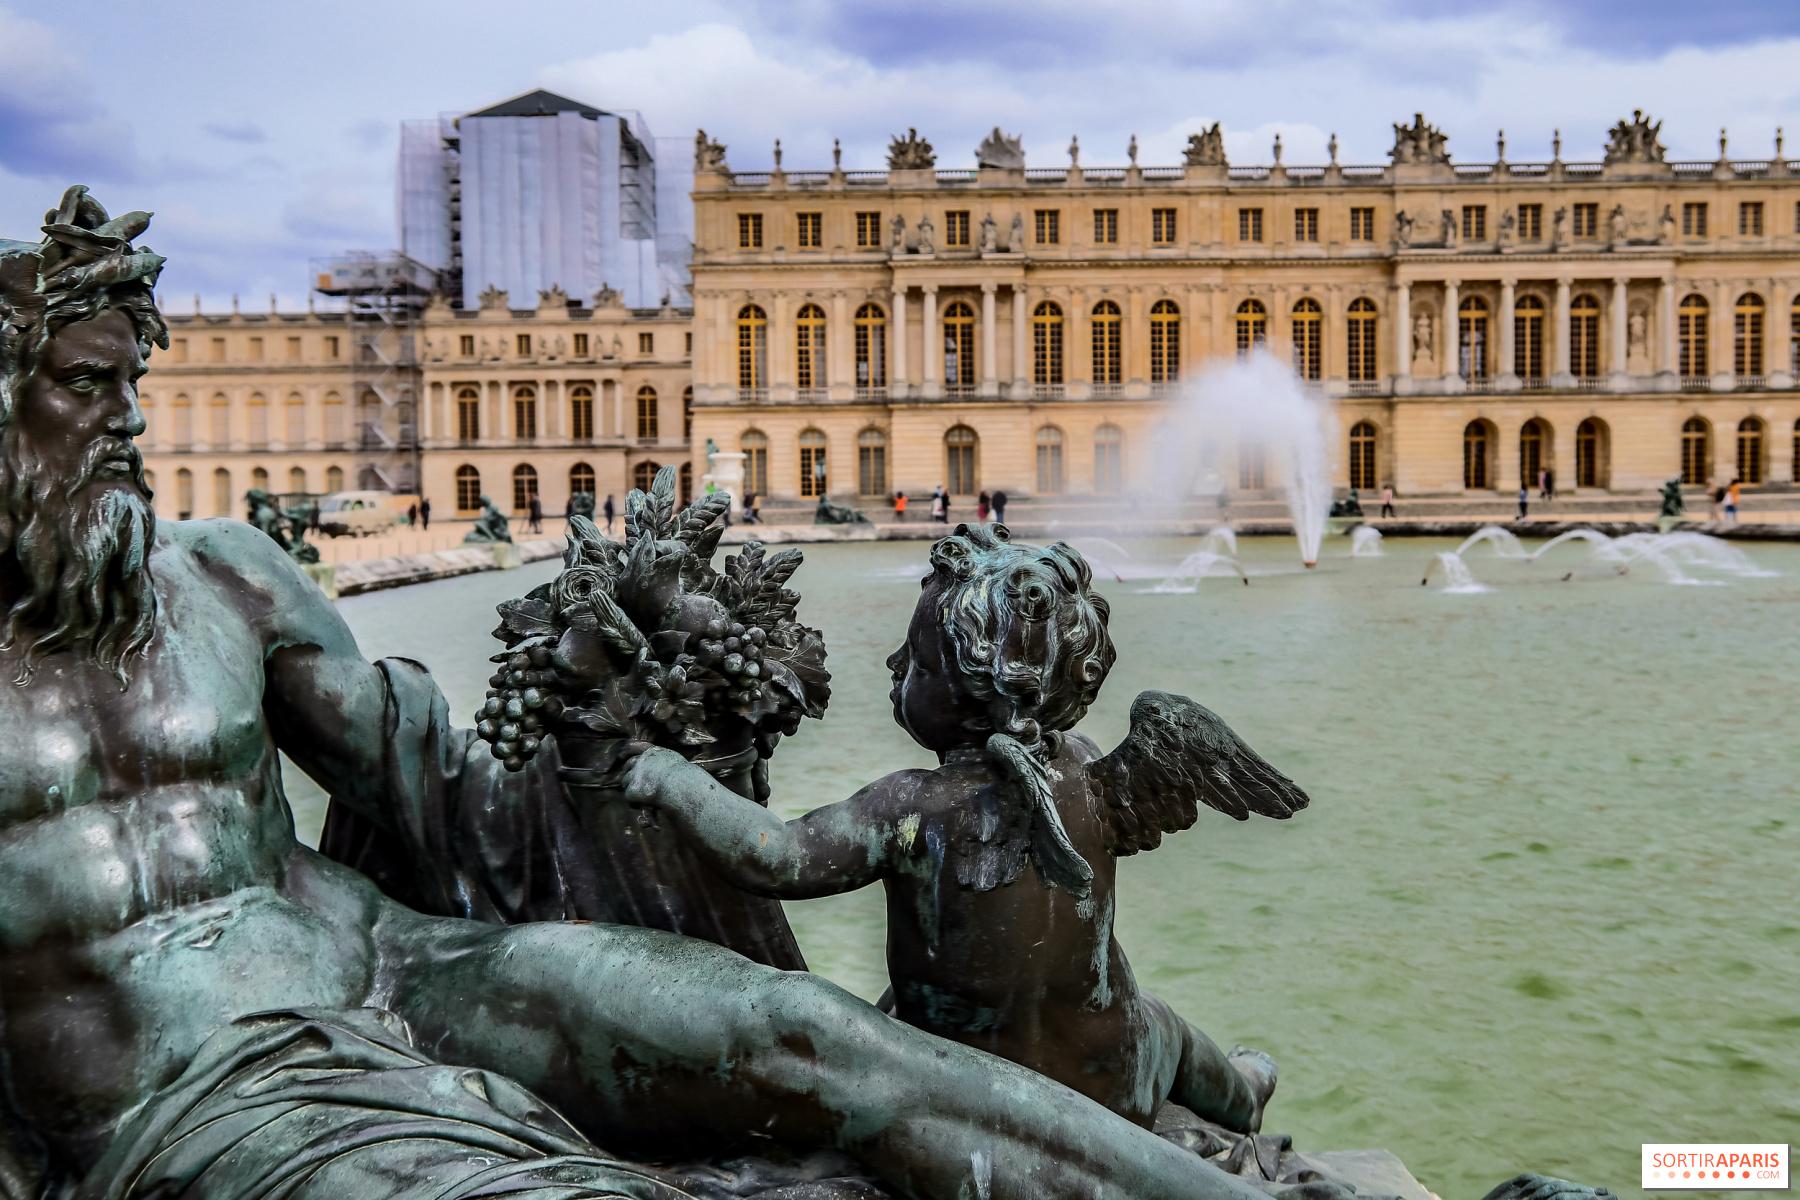 Garten Versailles Luxus Fountains Shows and Musical Gardens Of Versailles 2020